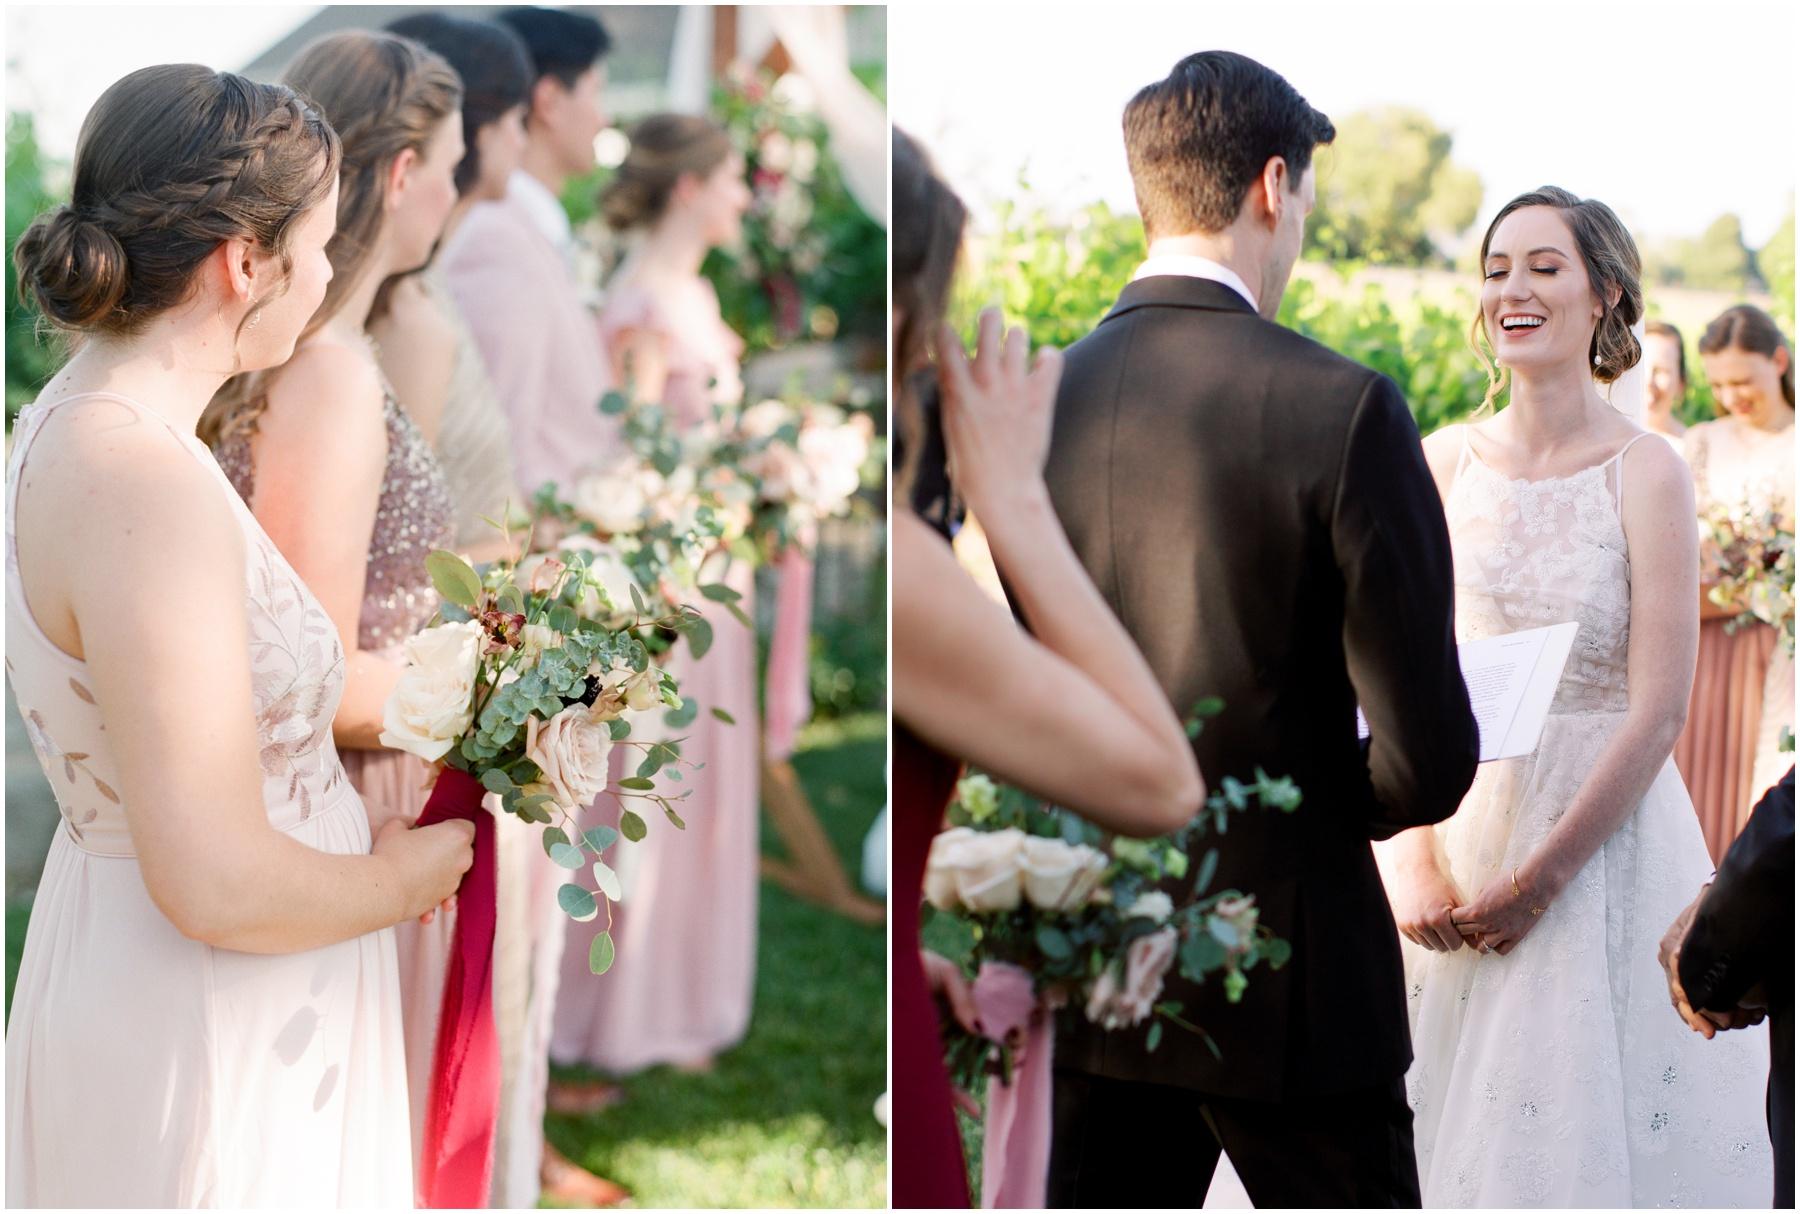 Scribner-bend-vineyards-wedding-sacramento-california-Kristine-Herman-Photography-21.jpg